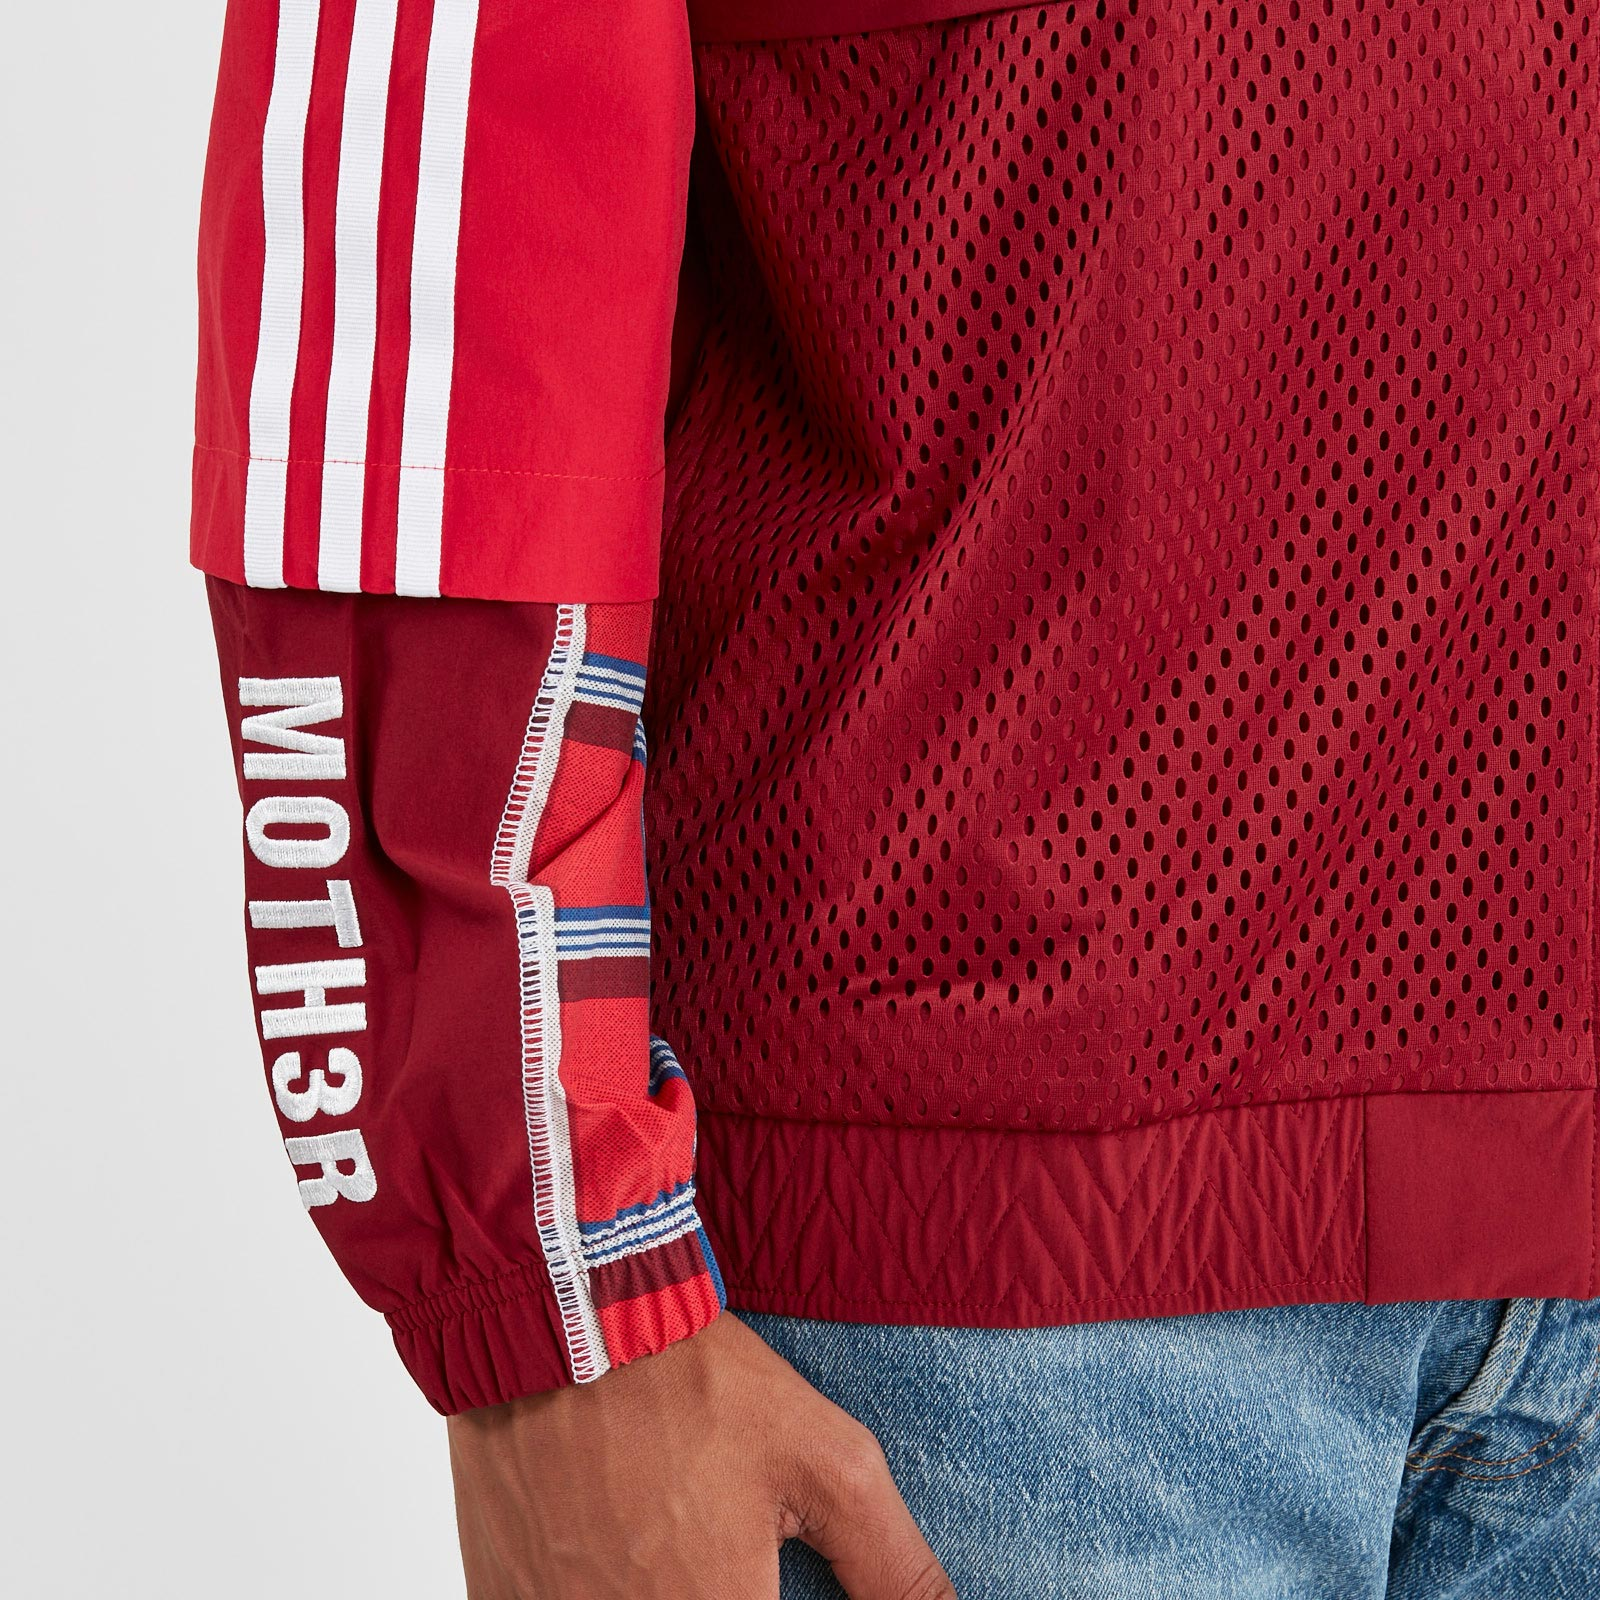 ADIDAS STATEMENT | Adidas x Pharrell Williams Afro HU FZ